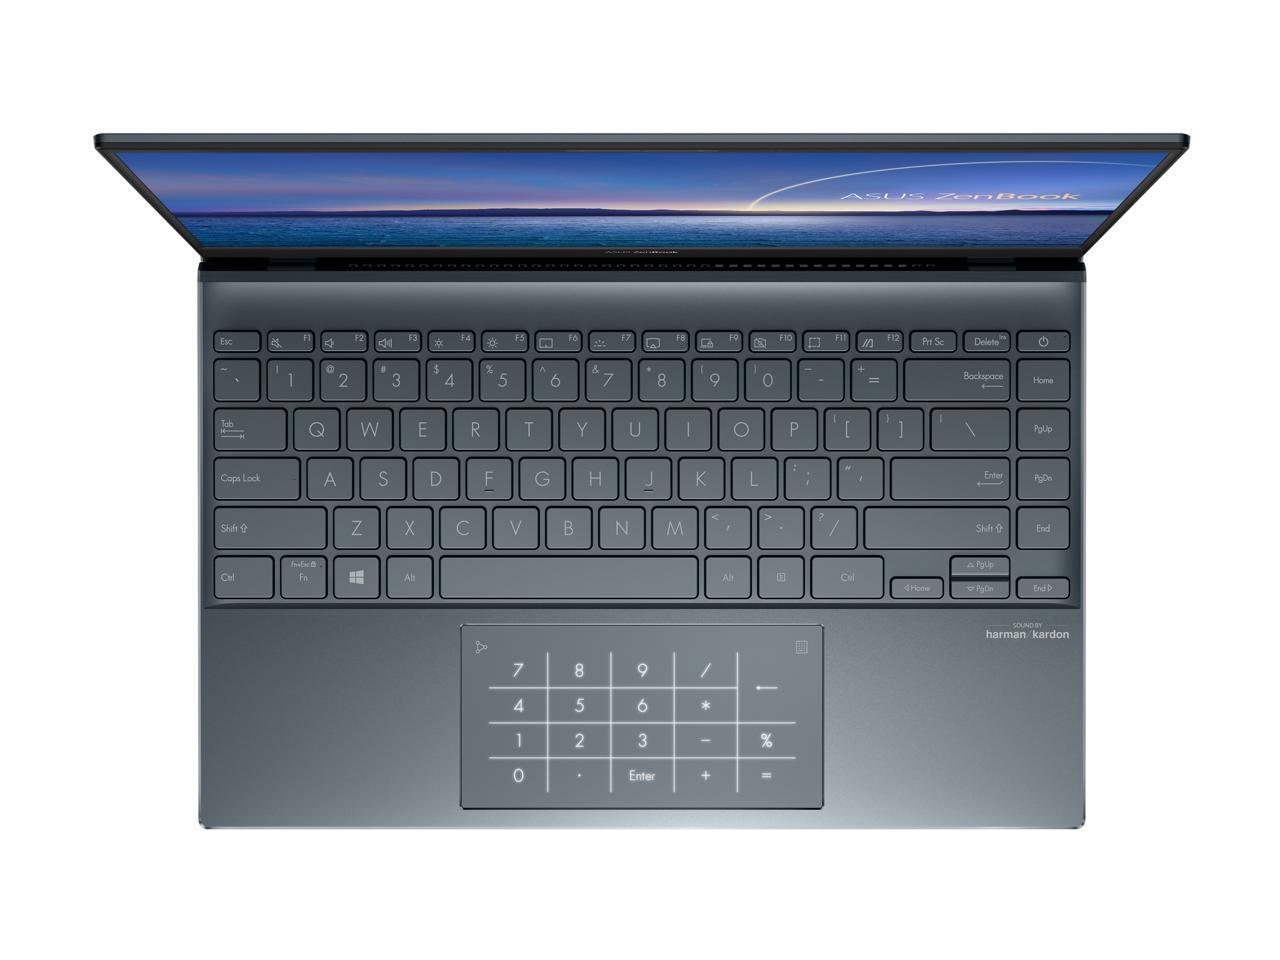 "ASUS Zenbook 14 UM425IA-NH74 (Ryzen 7-4700U/16GB/1TB SSD) Win 10, 14"" FHD"